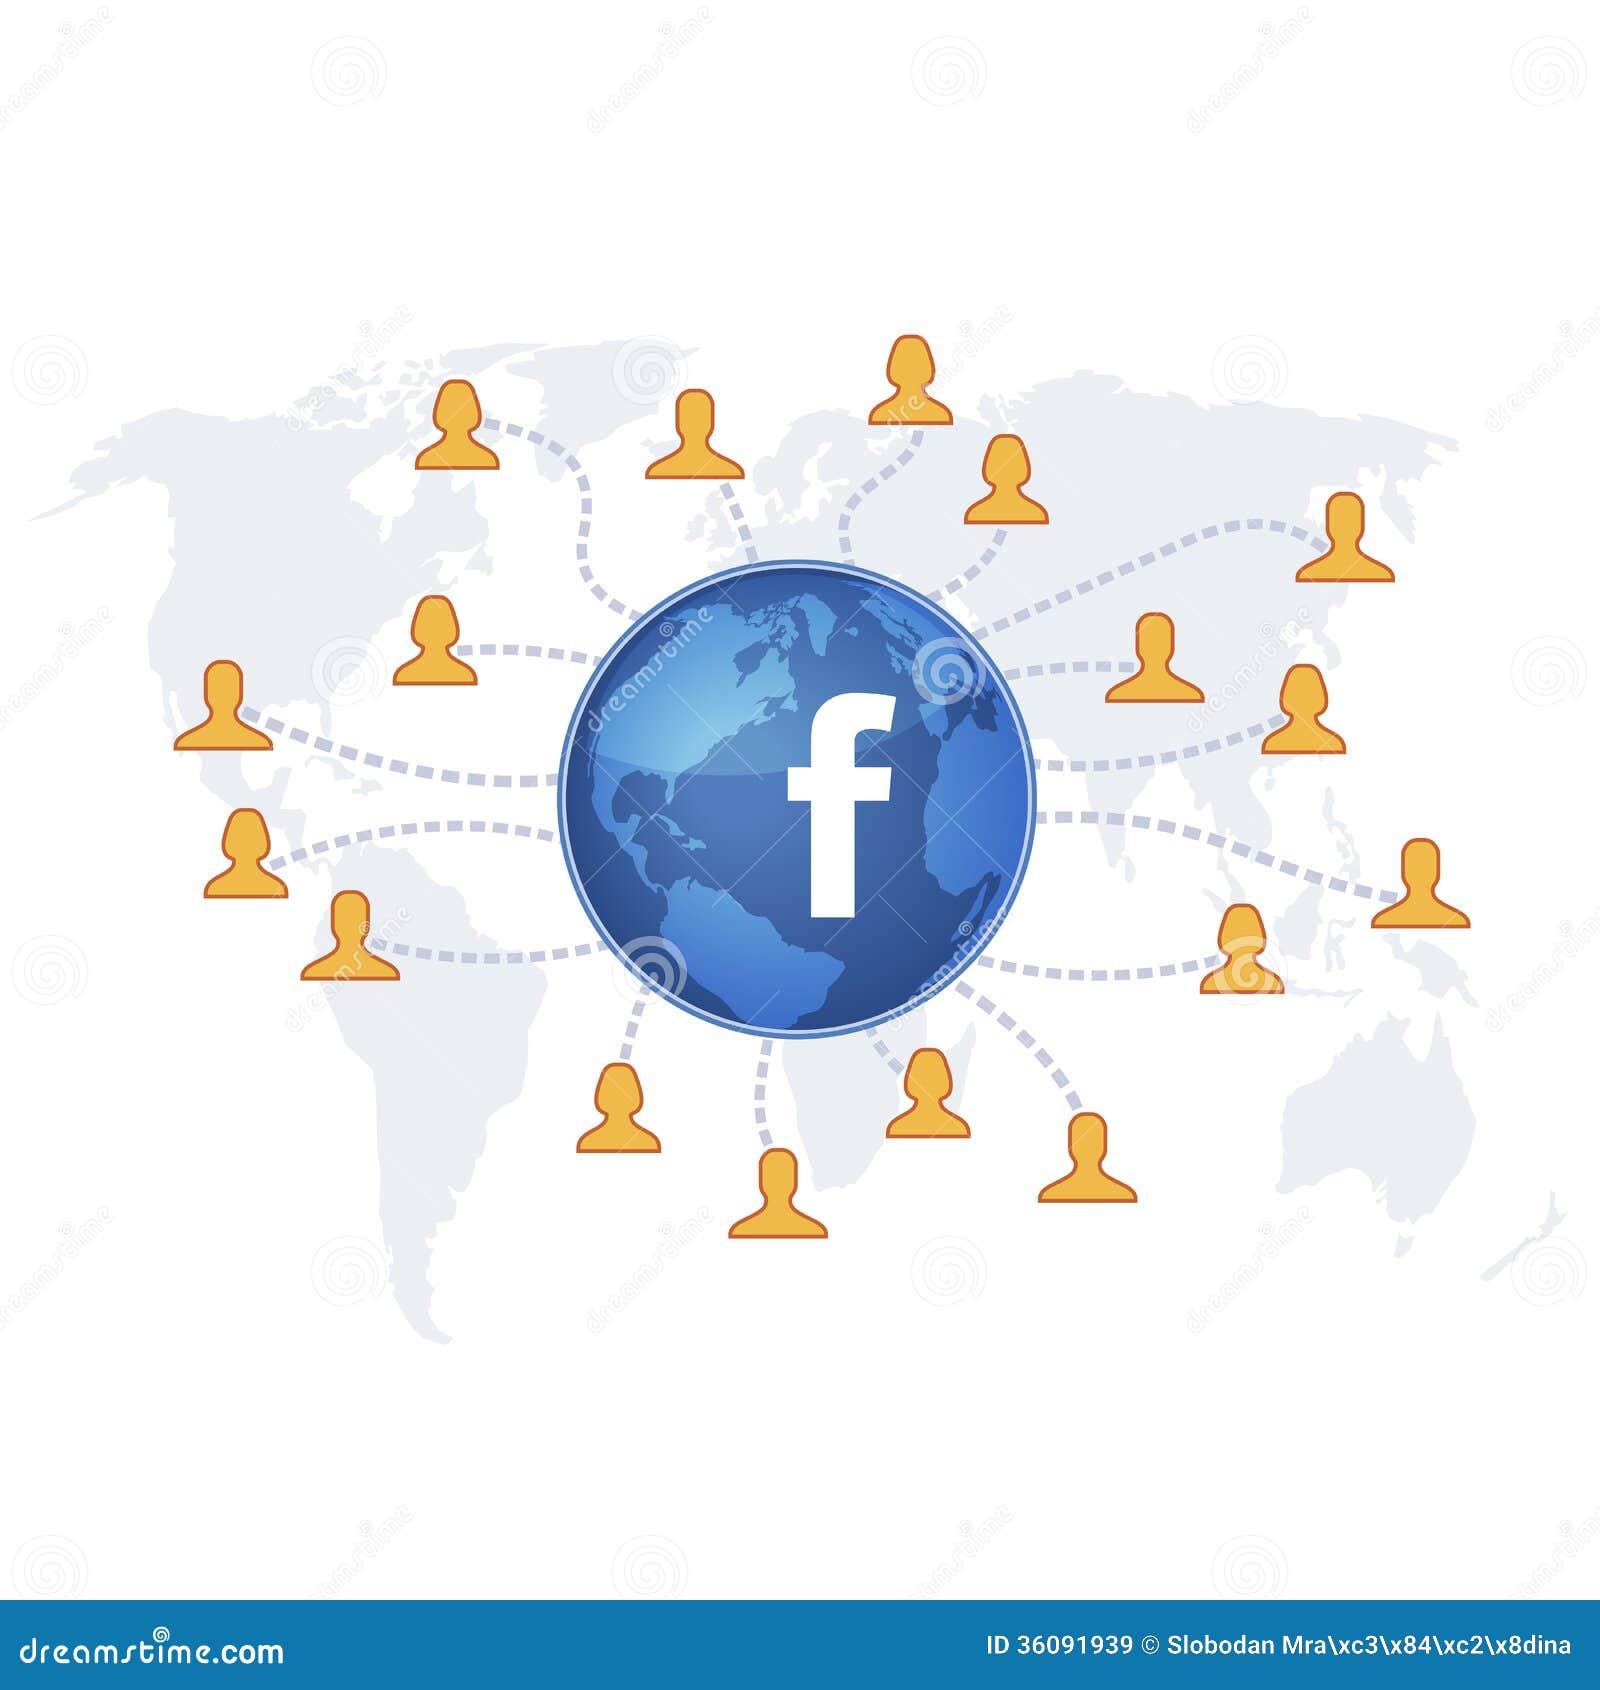 Viral Global News Viralglobalnews: Facebook Like Editorial Stock Image. Illustration Of